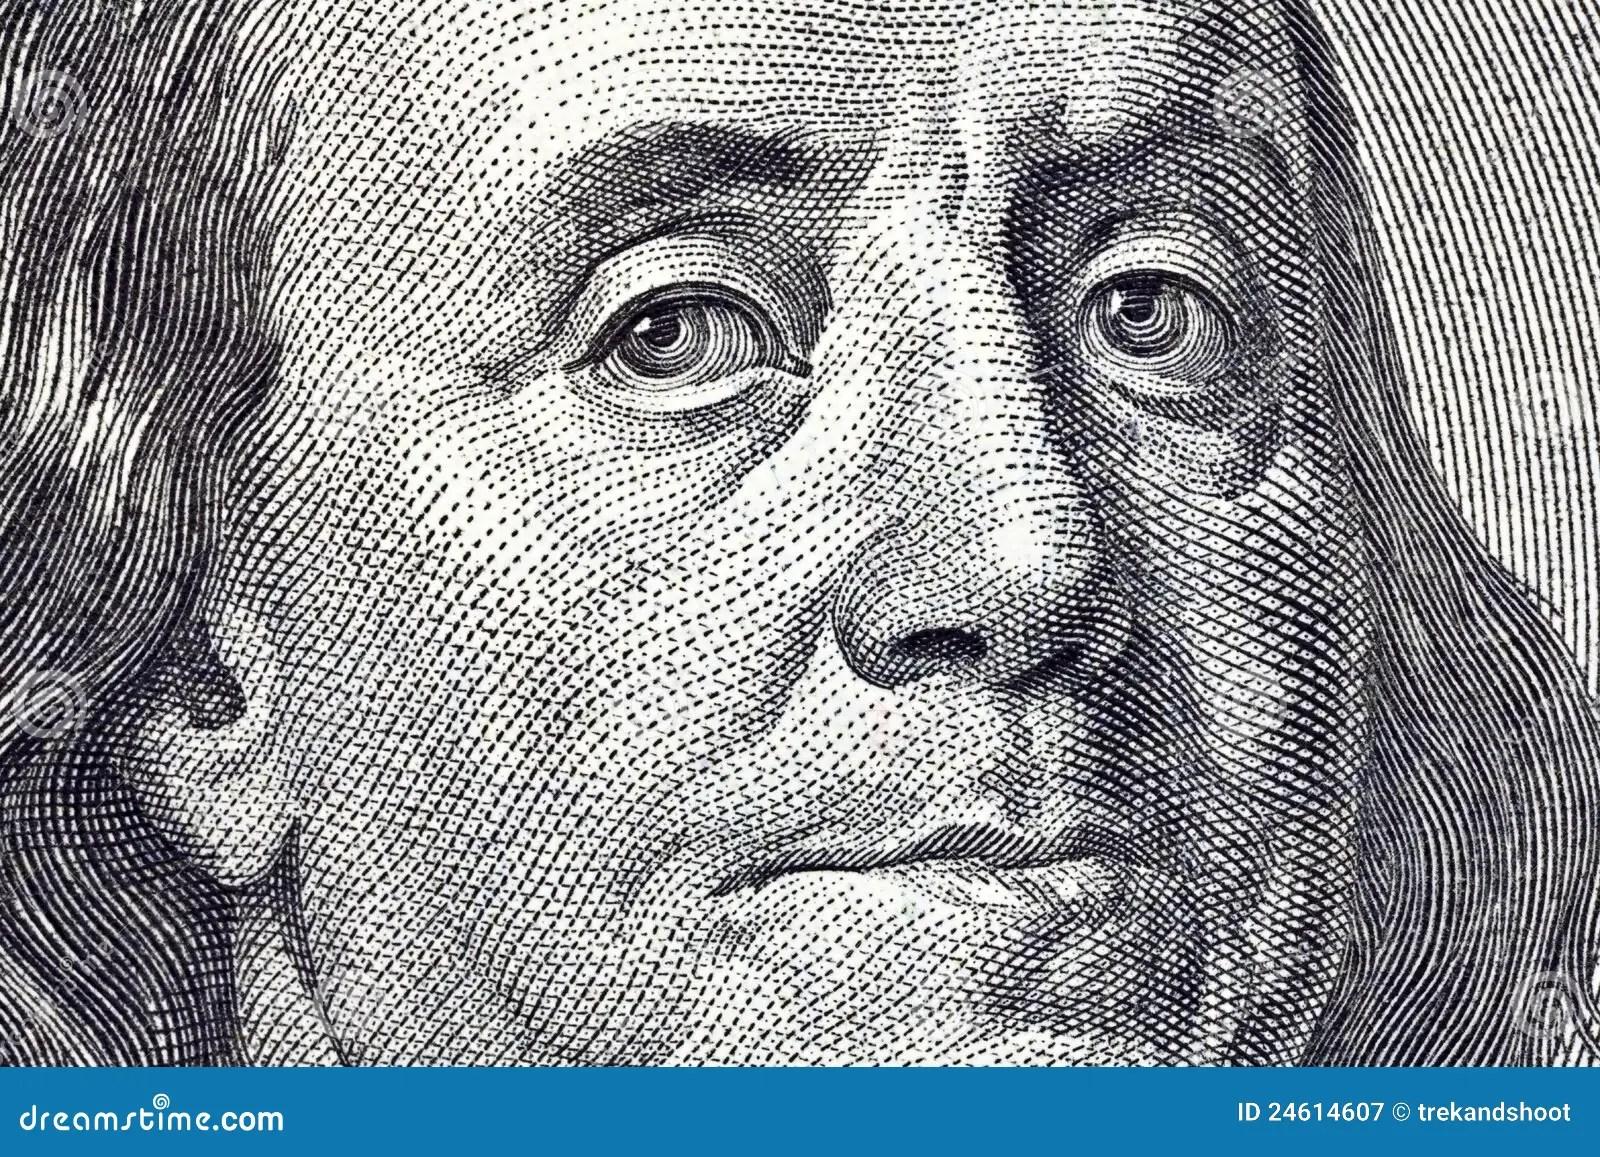 Ben Franklin Macro Close Up 100 Bill Stock Image